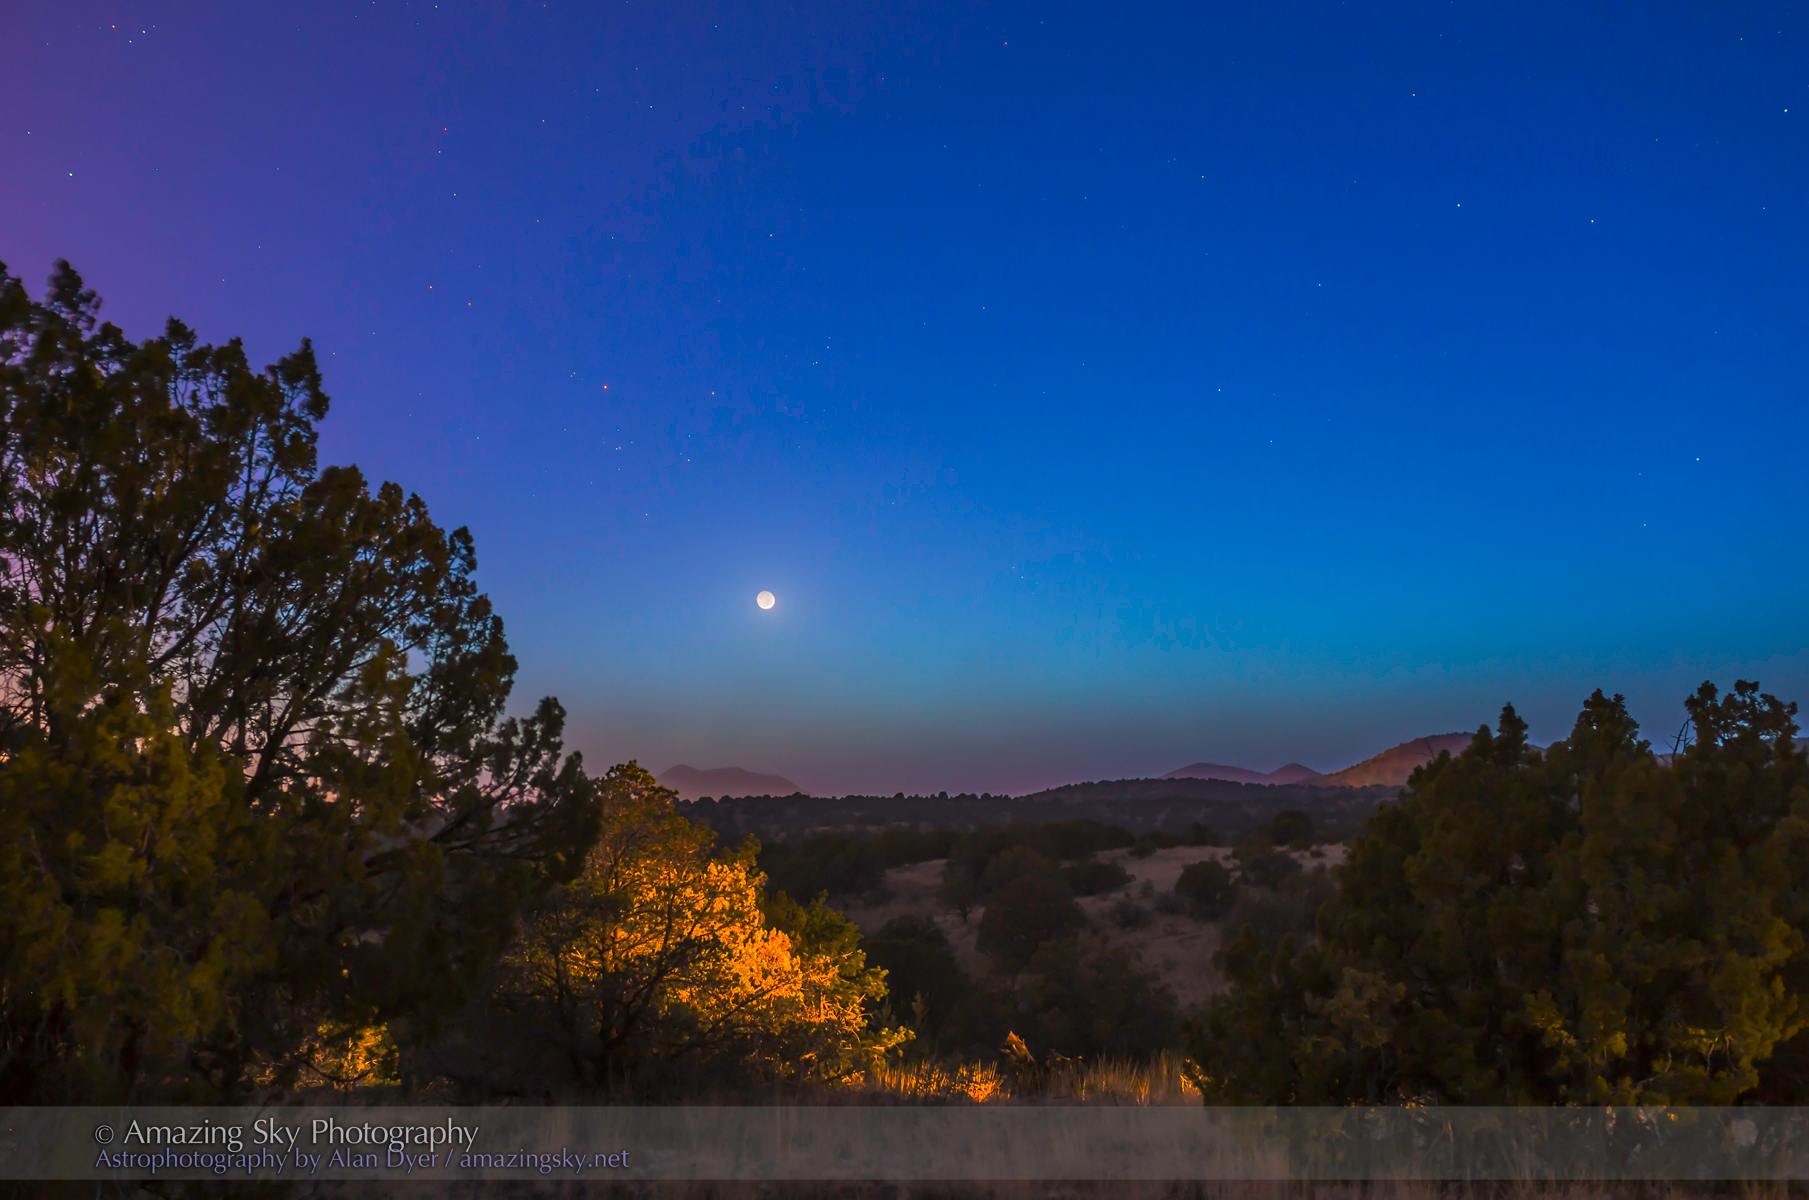 New Mexico New Moon (April 30, 2014)